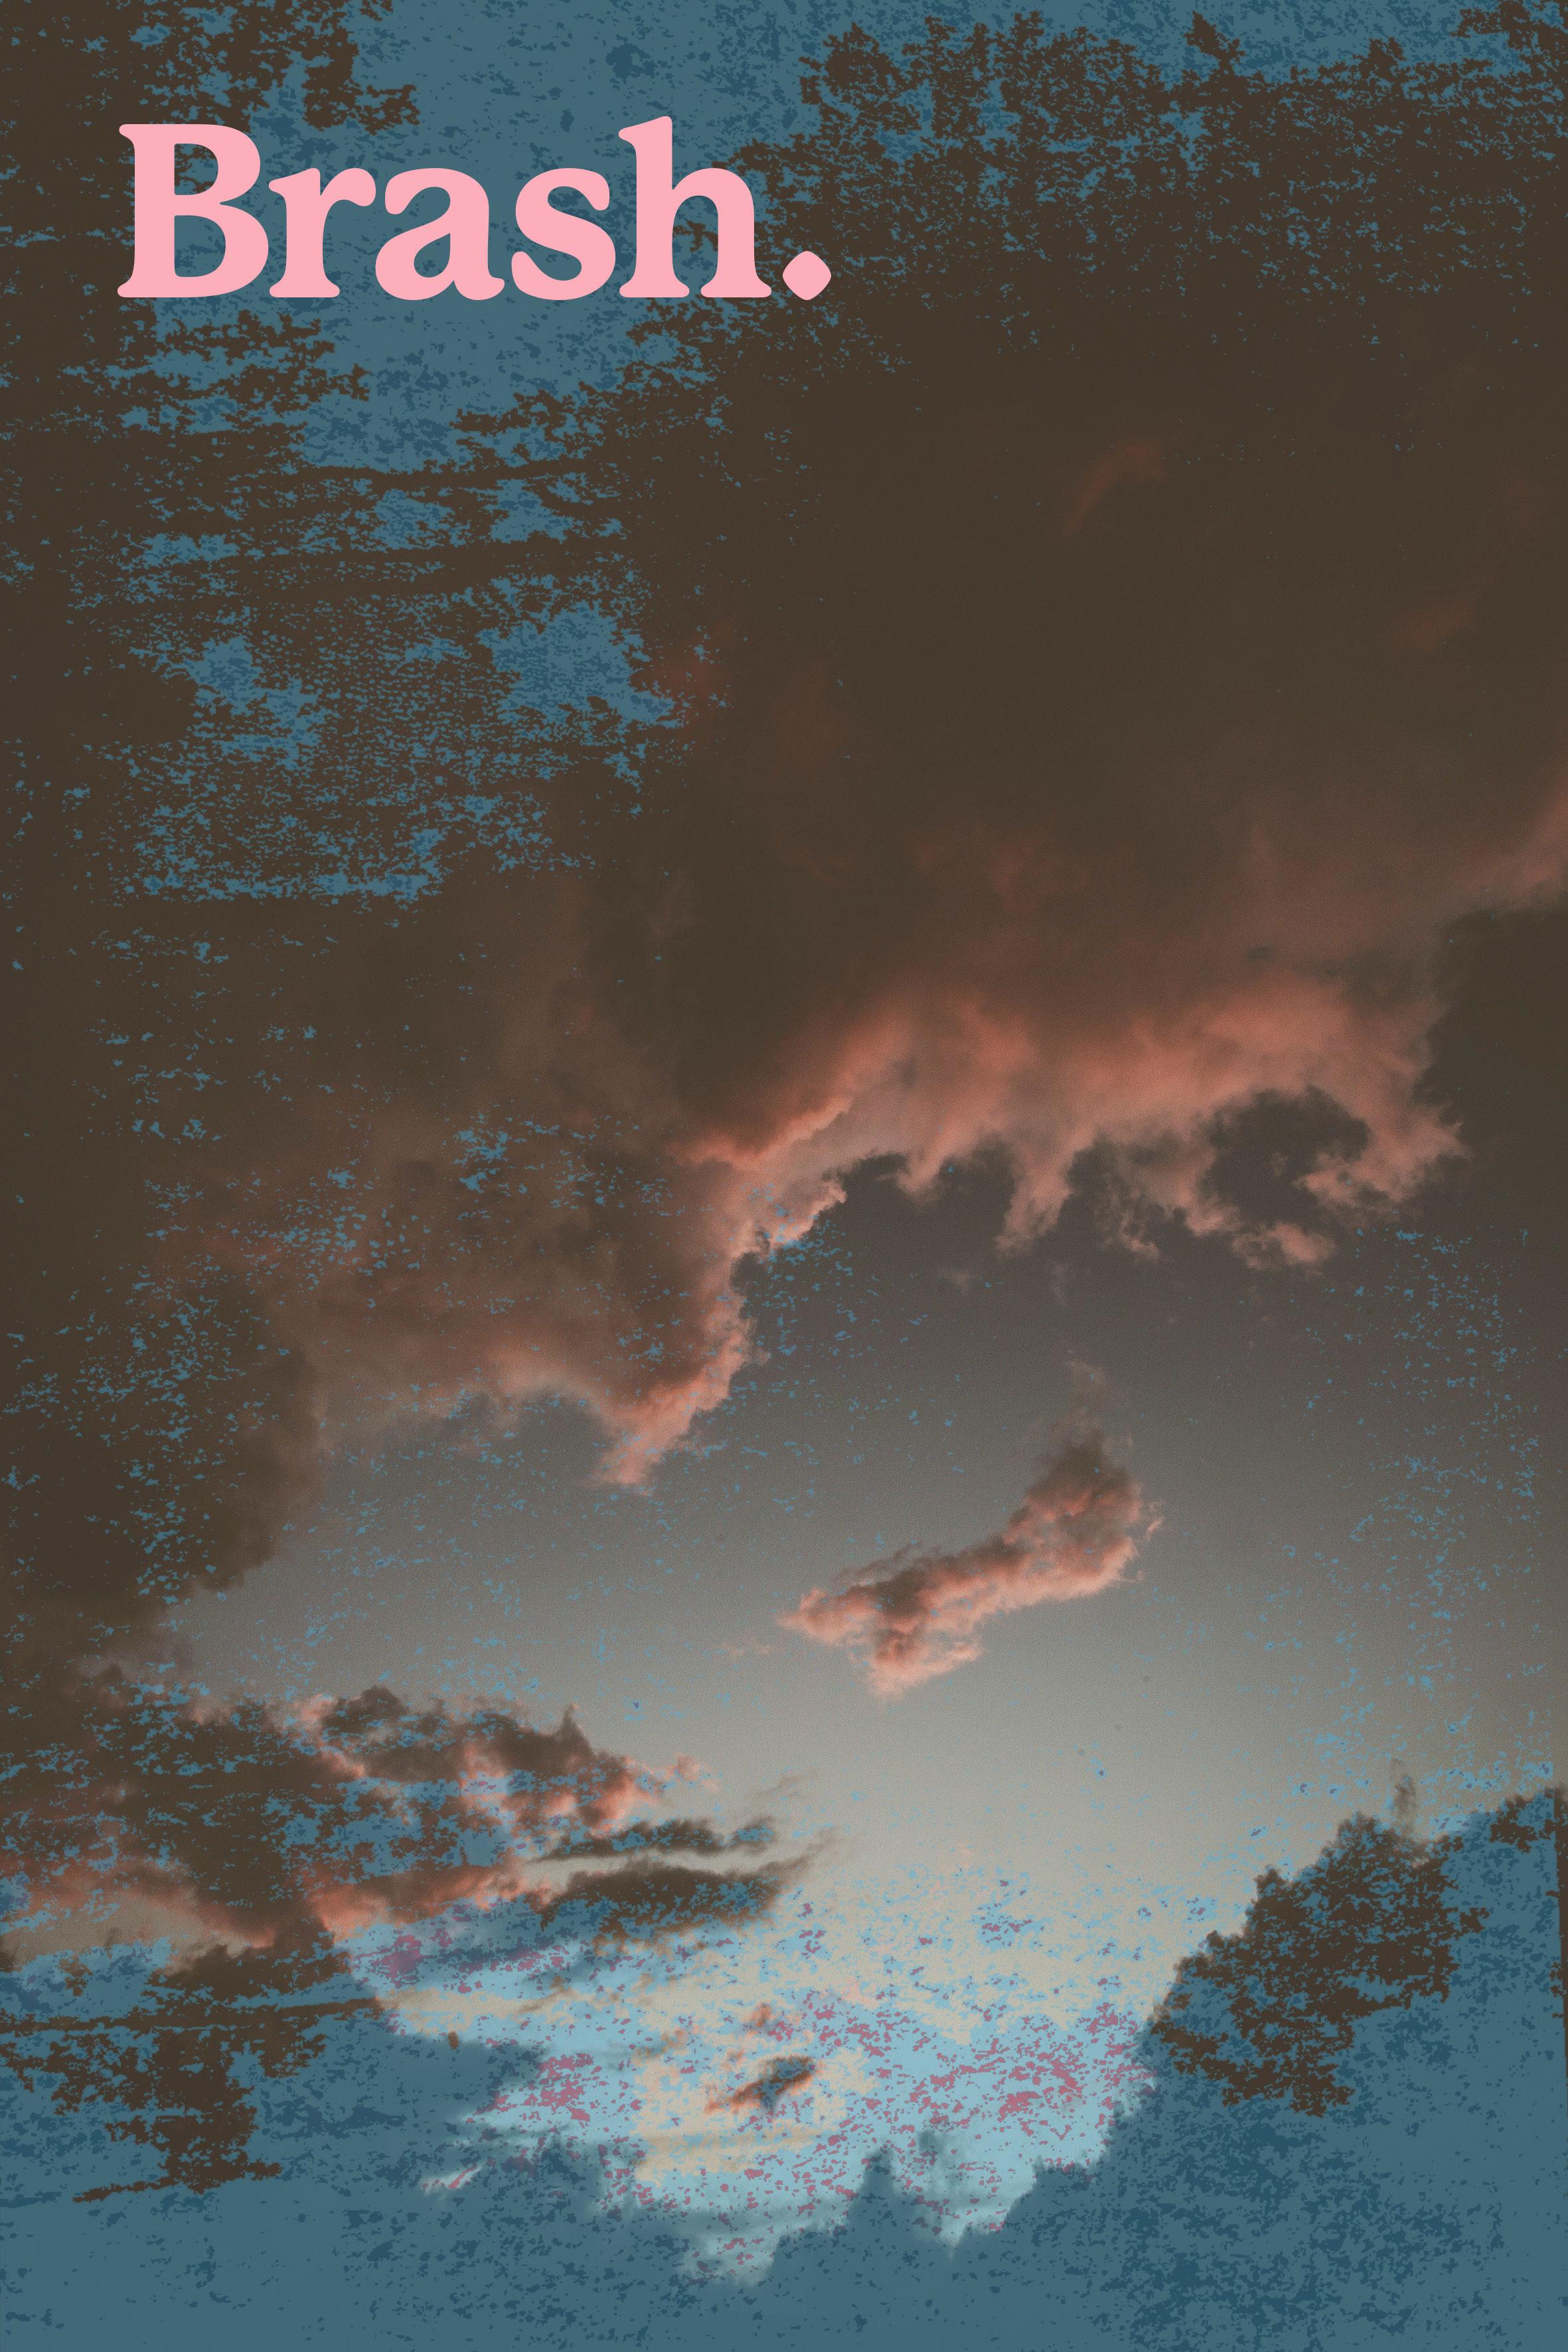 Brash_Clouds